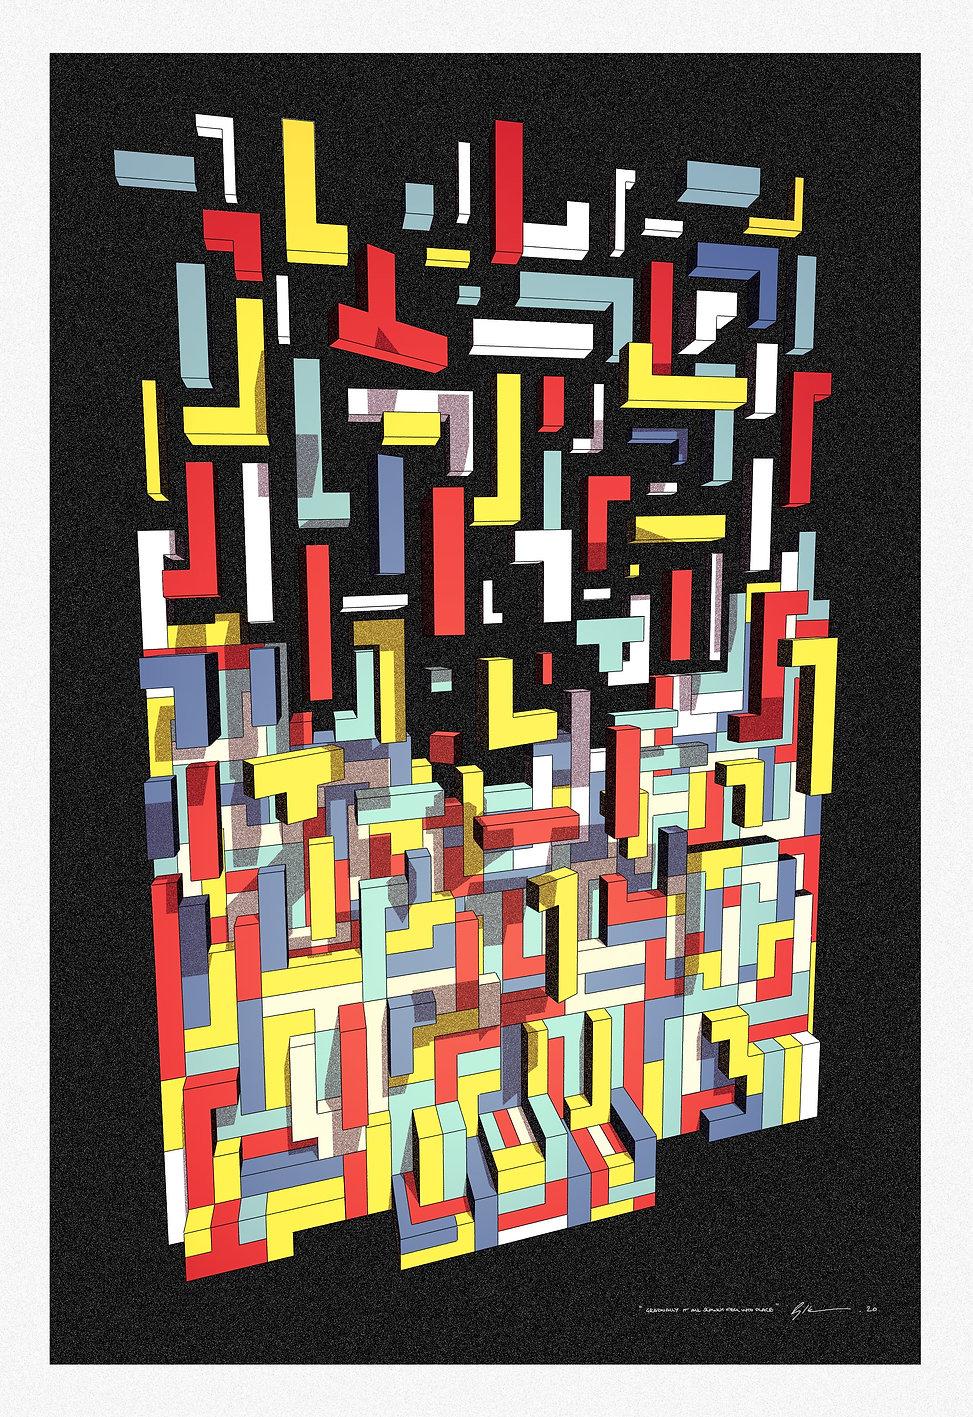 Thomas Radclyffe - People On The Ground